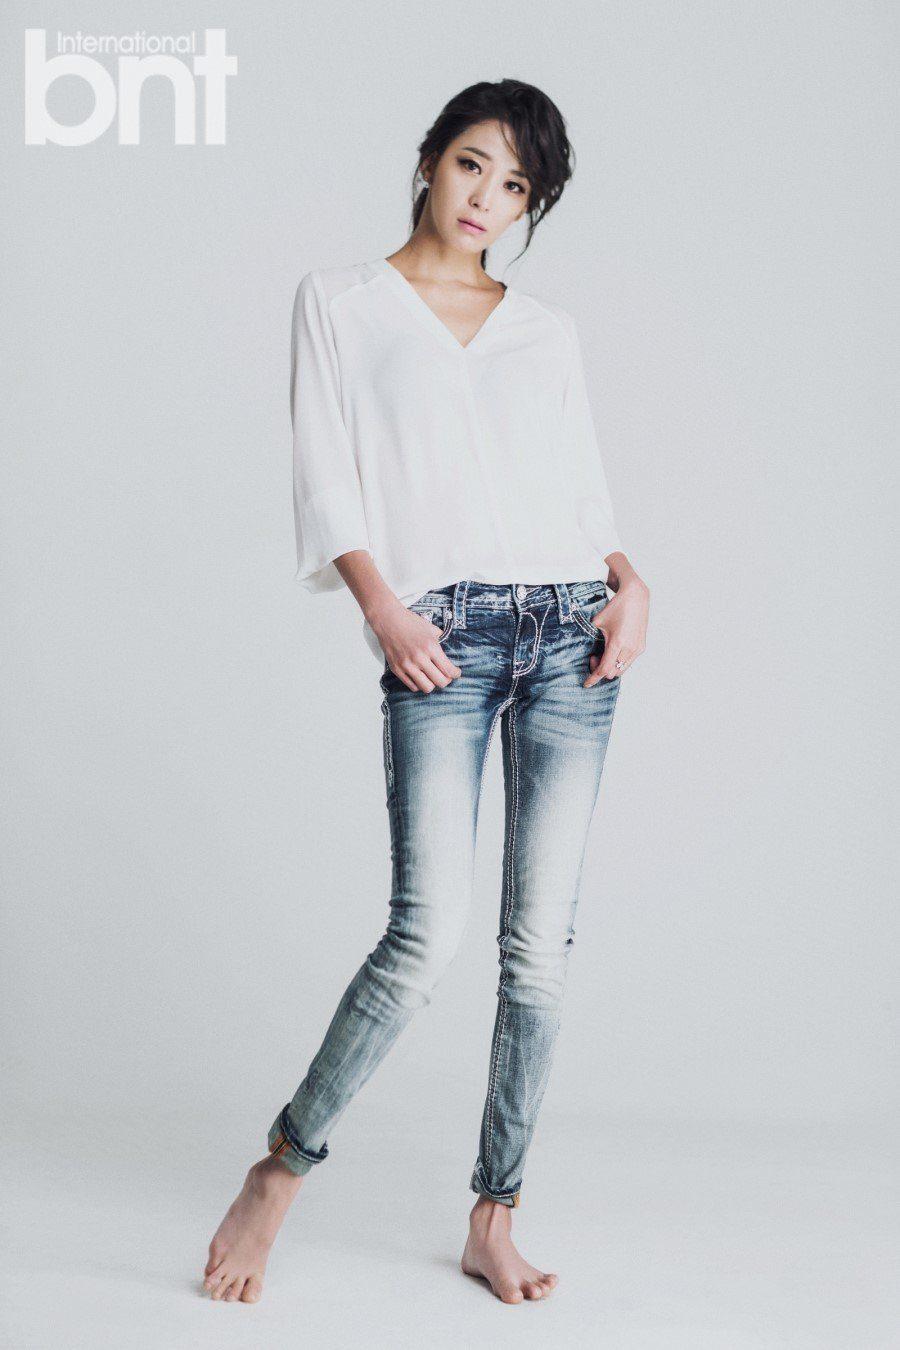 Model-actress Han Go Eun for International BNT Magazine. / Han Cinema